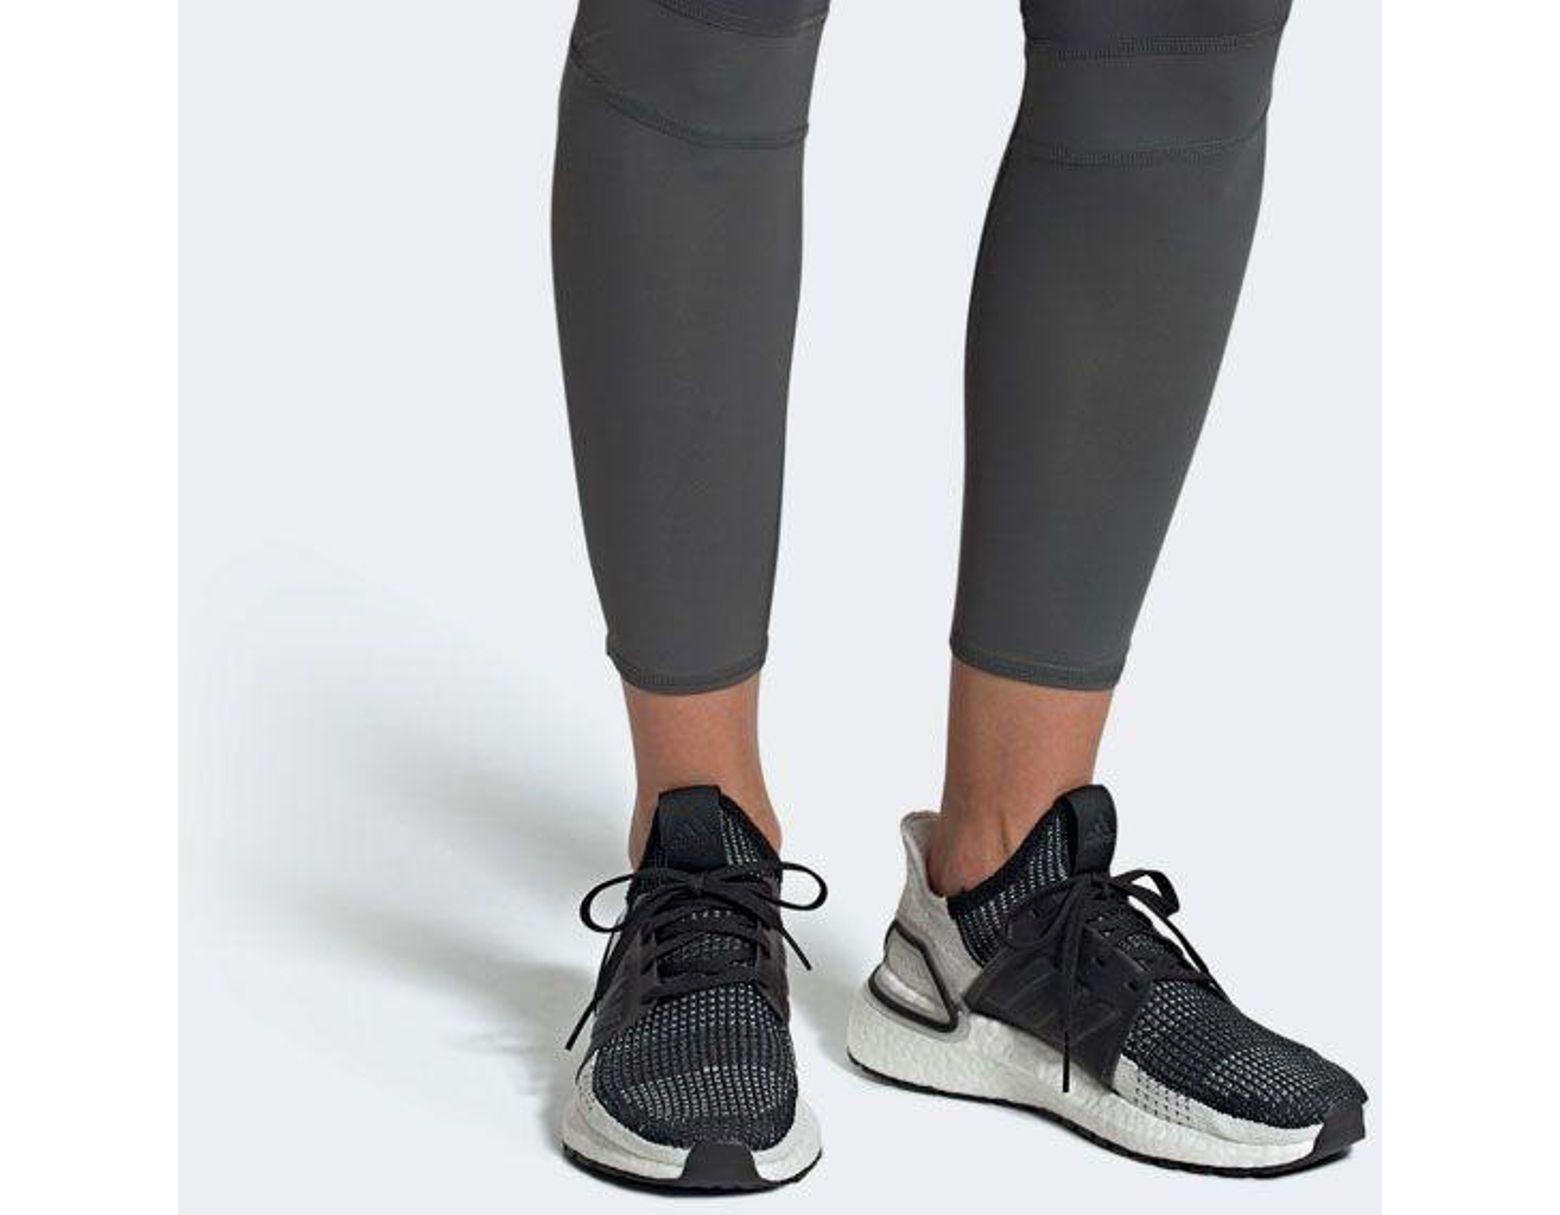 ccf27fcff42fa Lyst - adidas Ultraboost 19 Running Shoes in Black